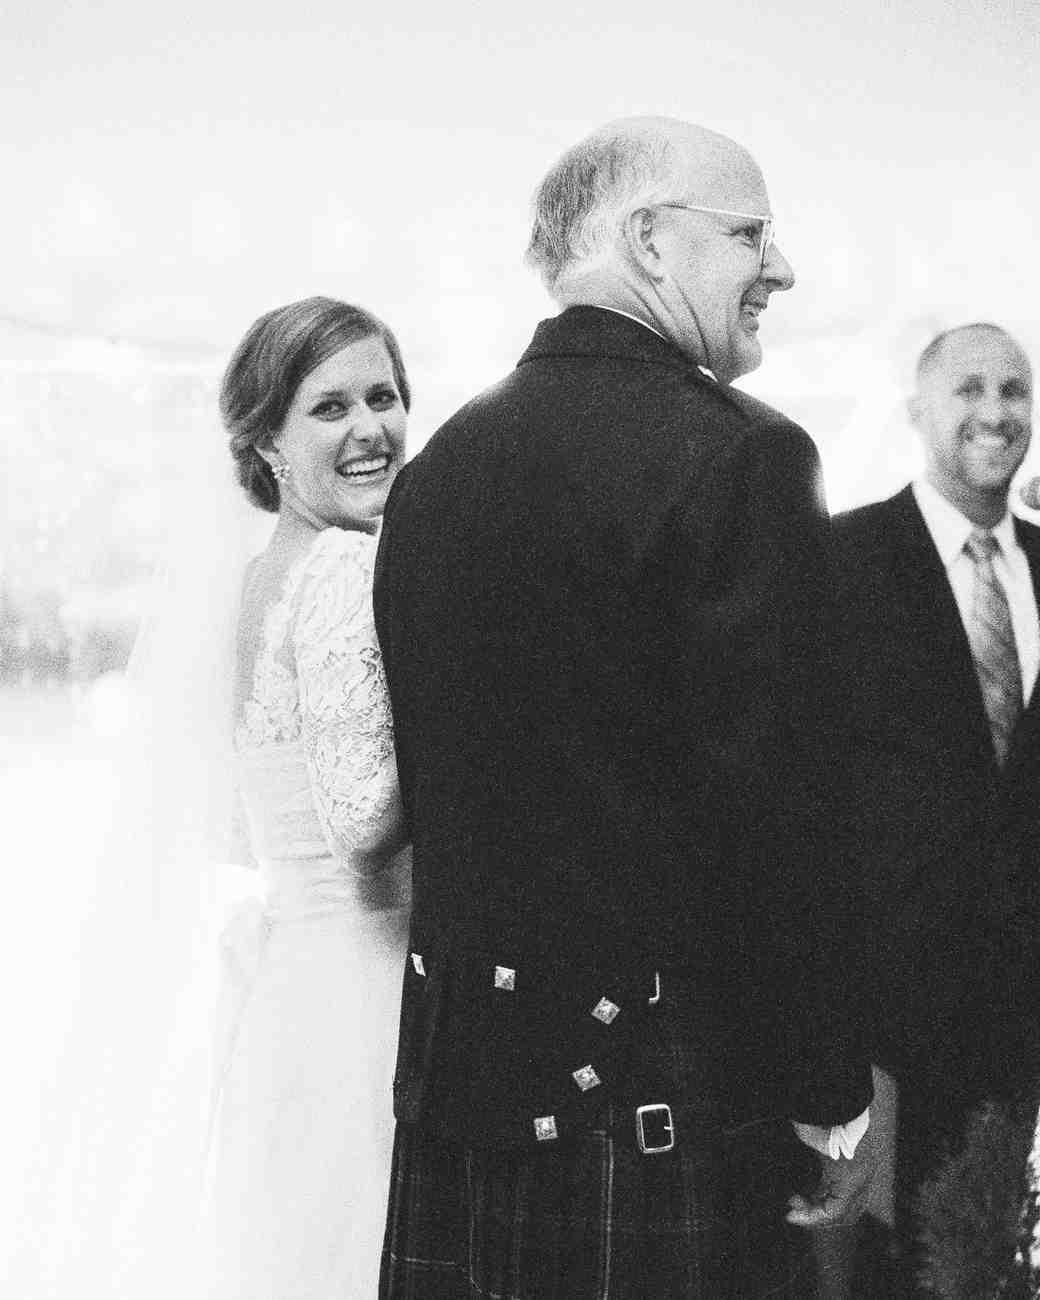 annie-chris-wedding-father-0314.jpg